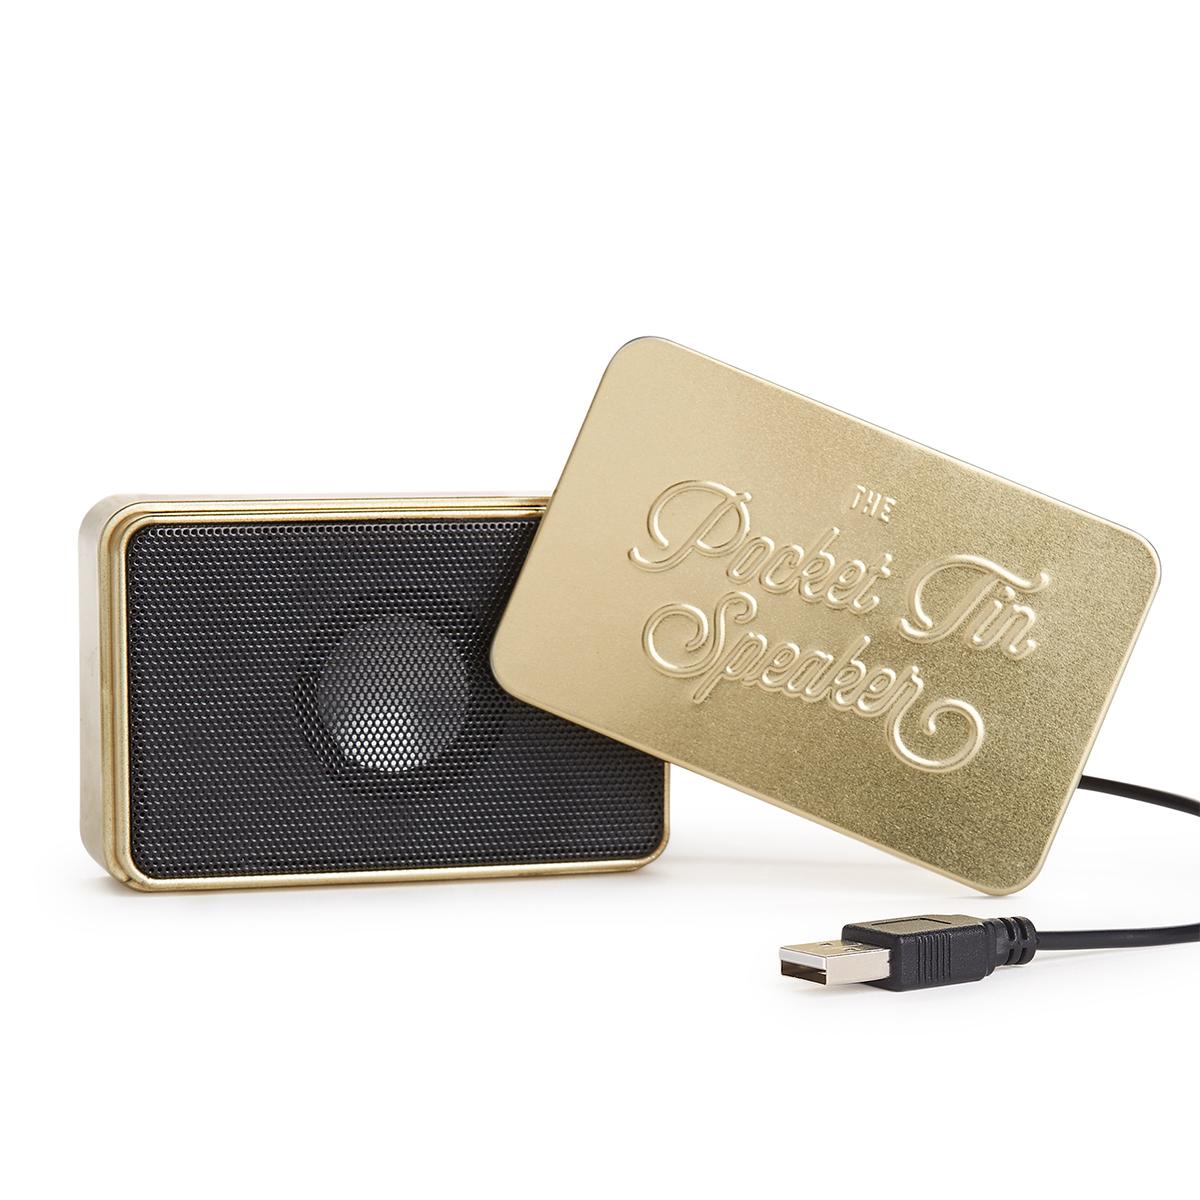 Mini-Bluetooth-Lautsprecher in der Blechdose